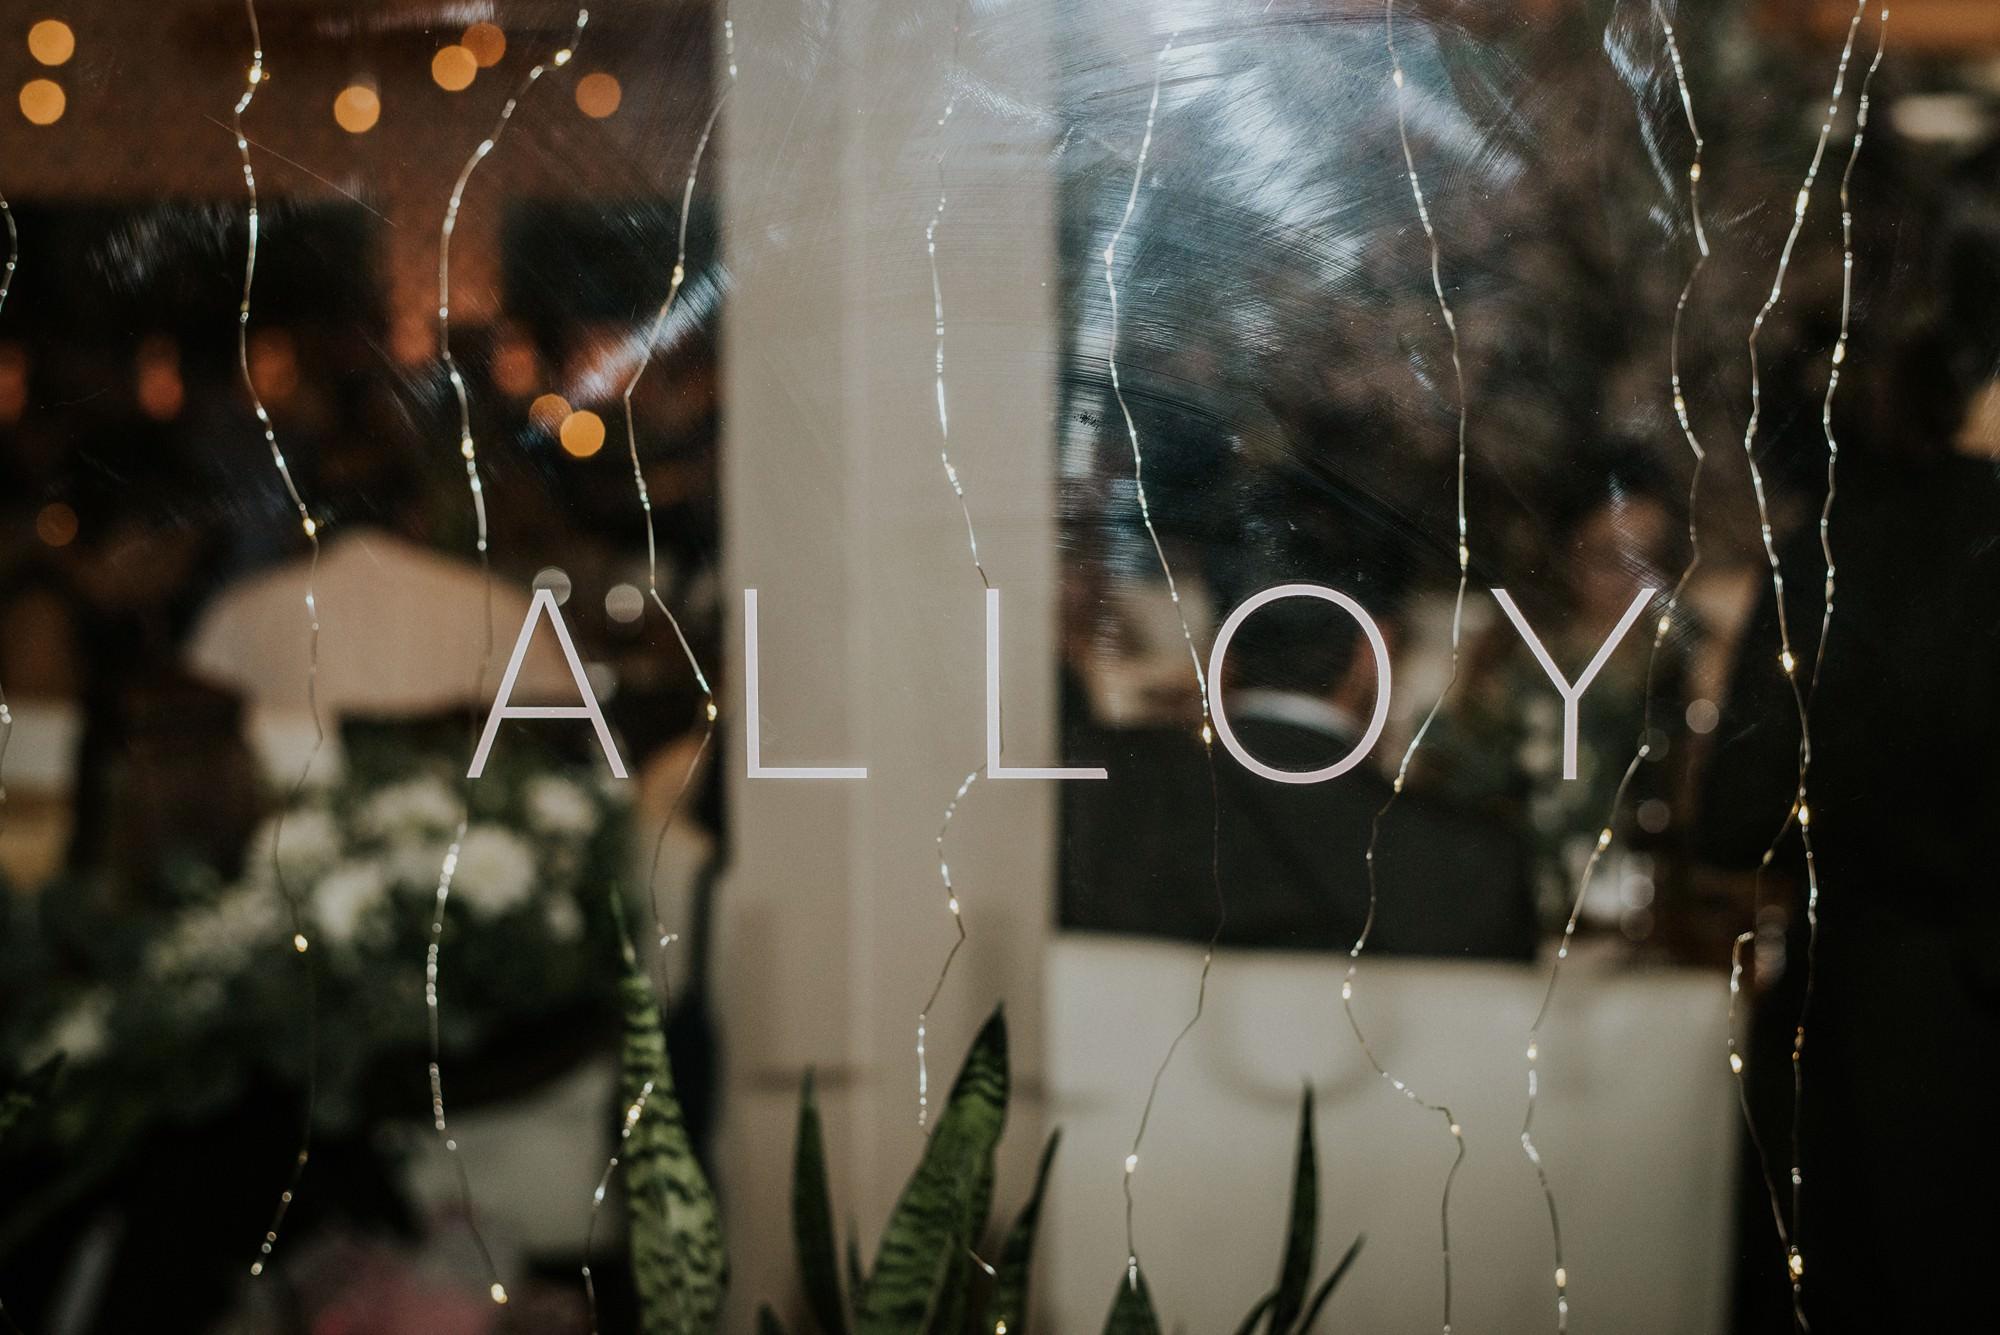 alloy restaurant events